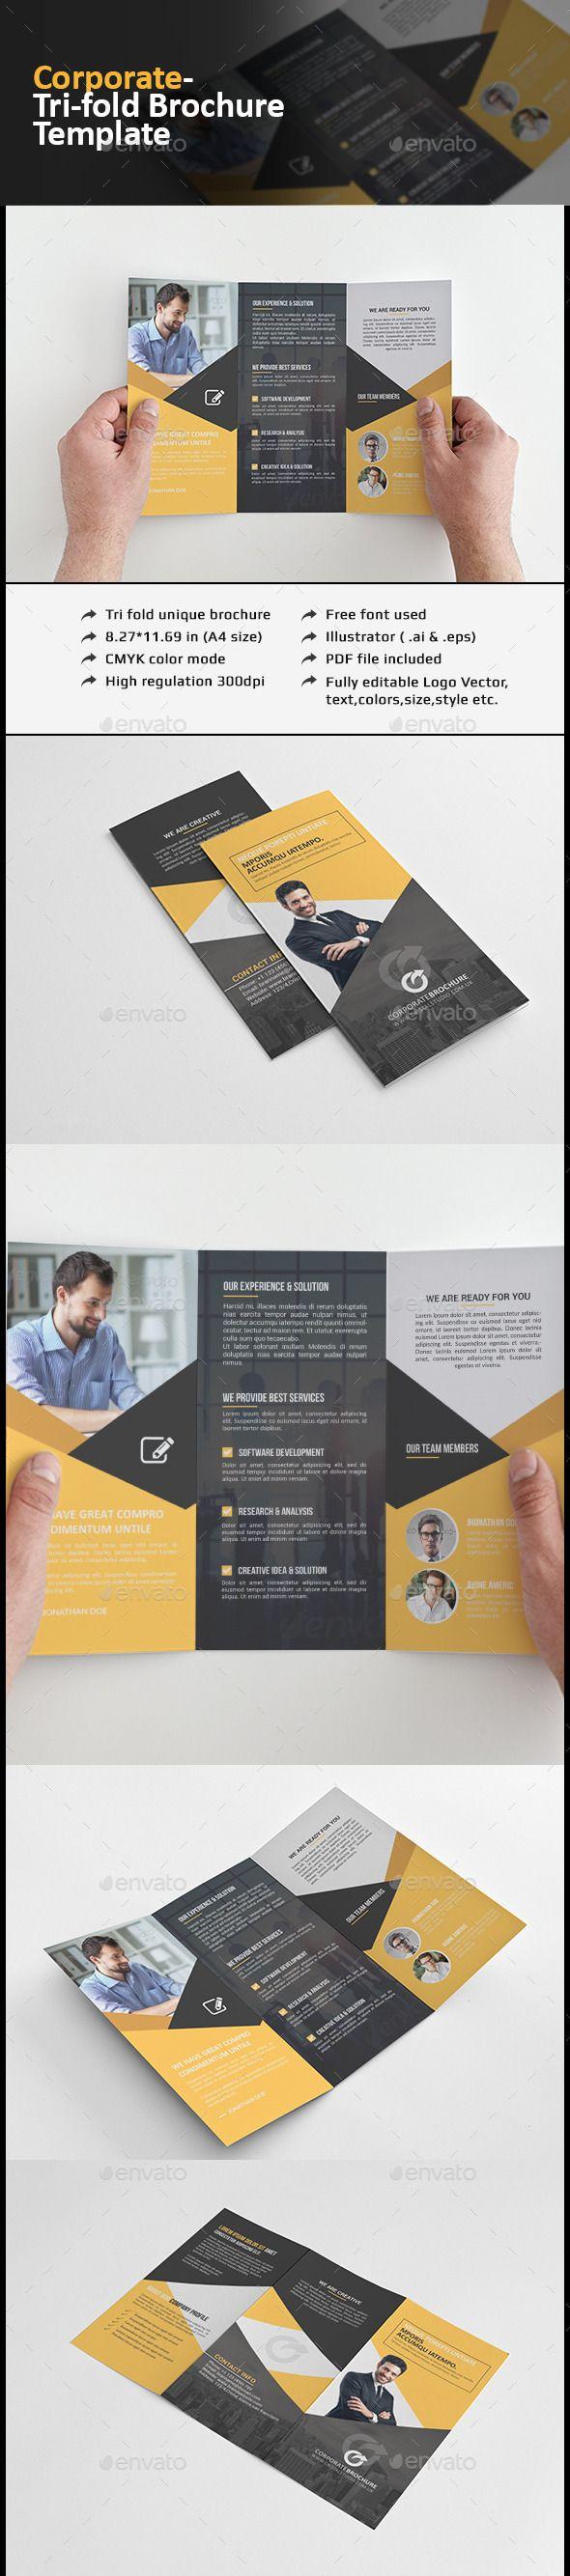 Corporate Tri-fold Brochure-Multipurpose Template #printdesign #design Download: http://graphicriver.net/item/corporate-trifold-brochuremultipurpose/12077960?ref=ksioks